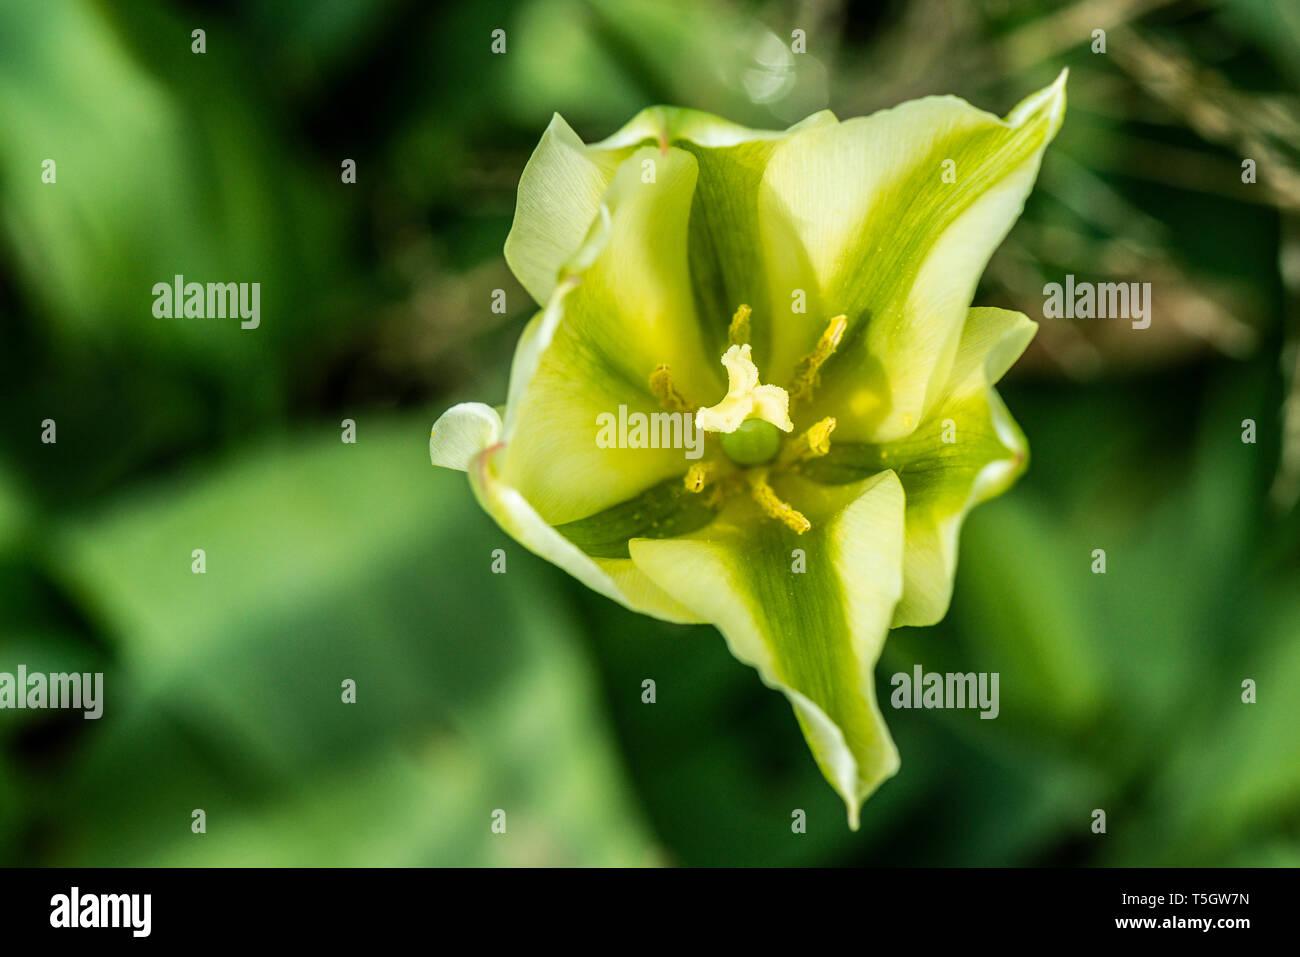 Tulip 'Spring Green' (Tulipa 'Spring Green') - Stock Image